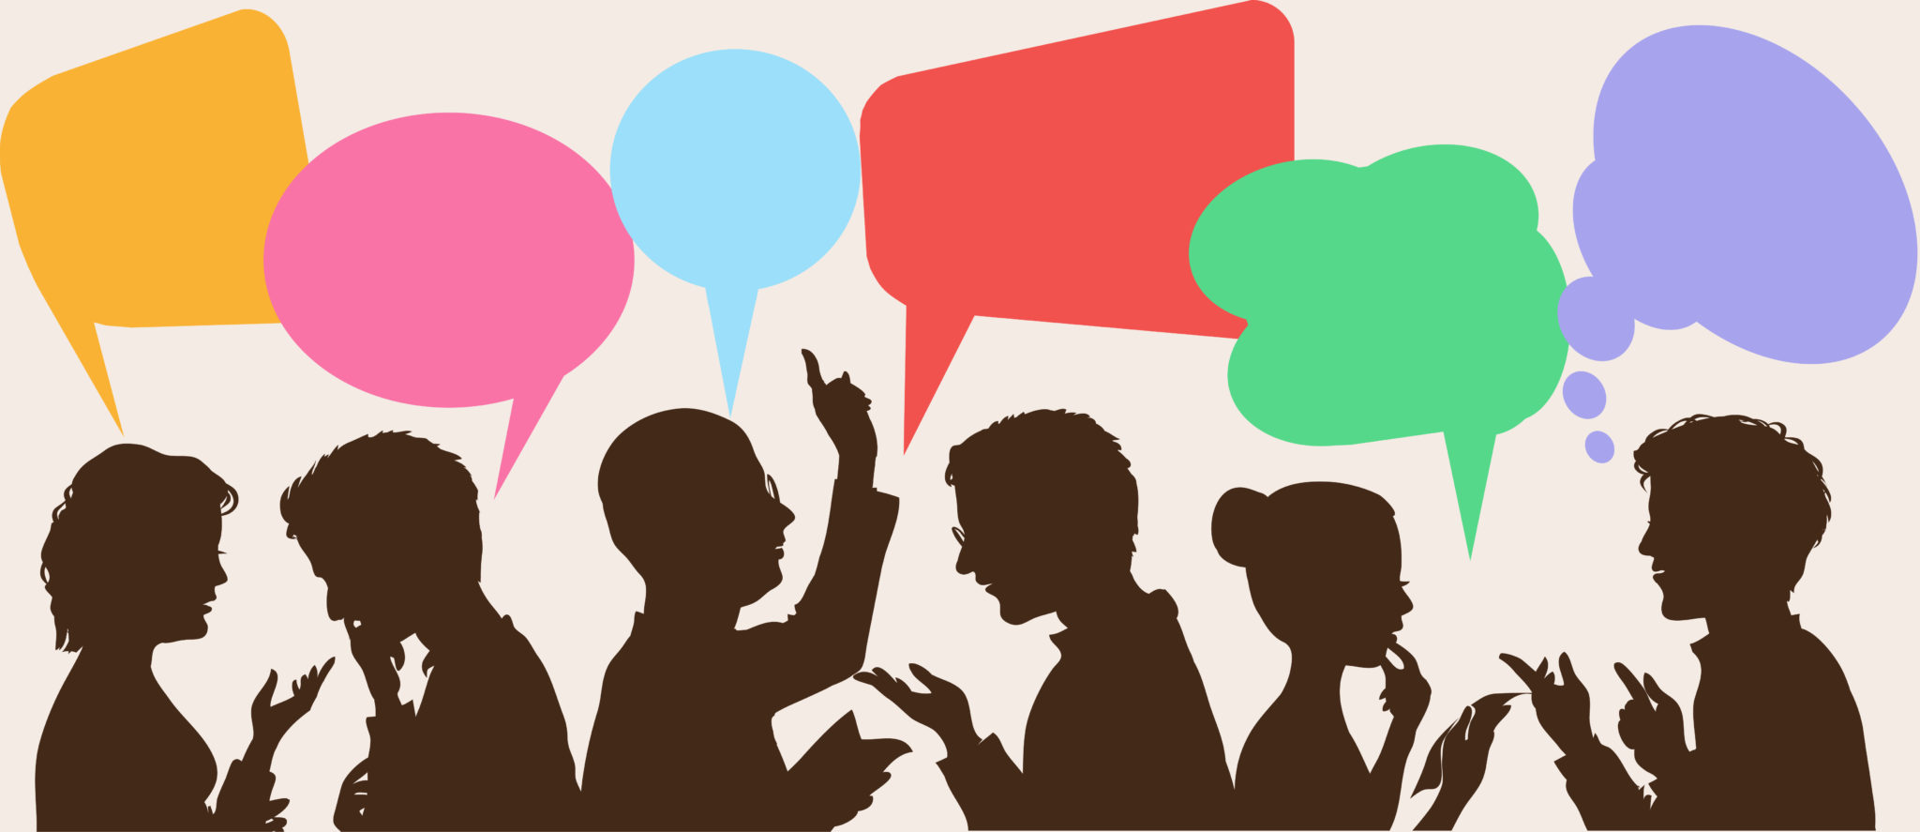 invite dialogue